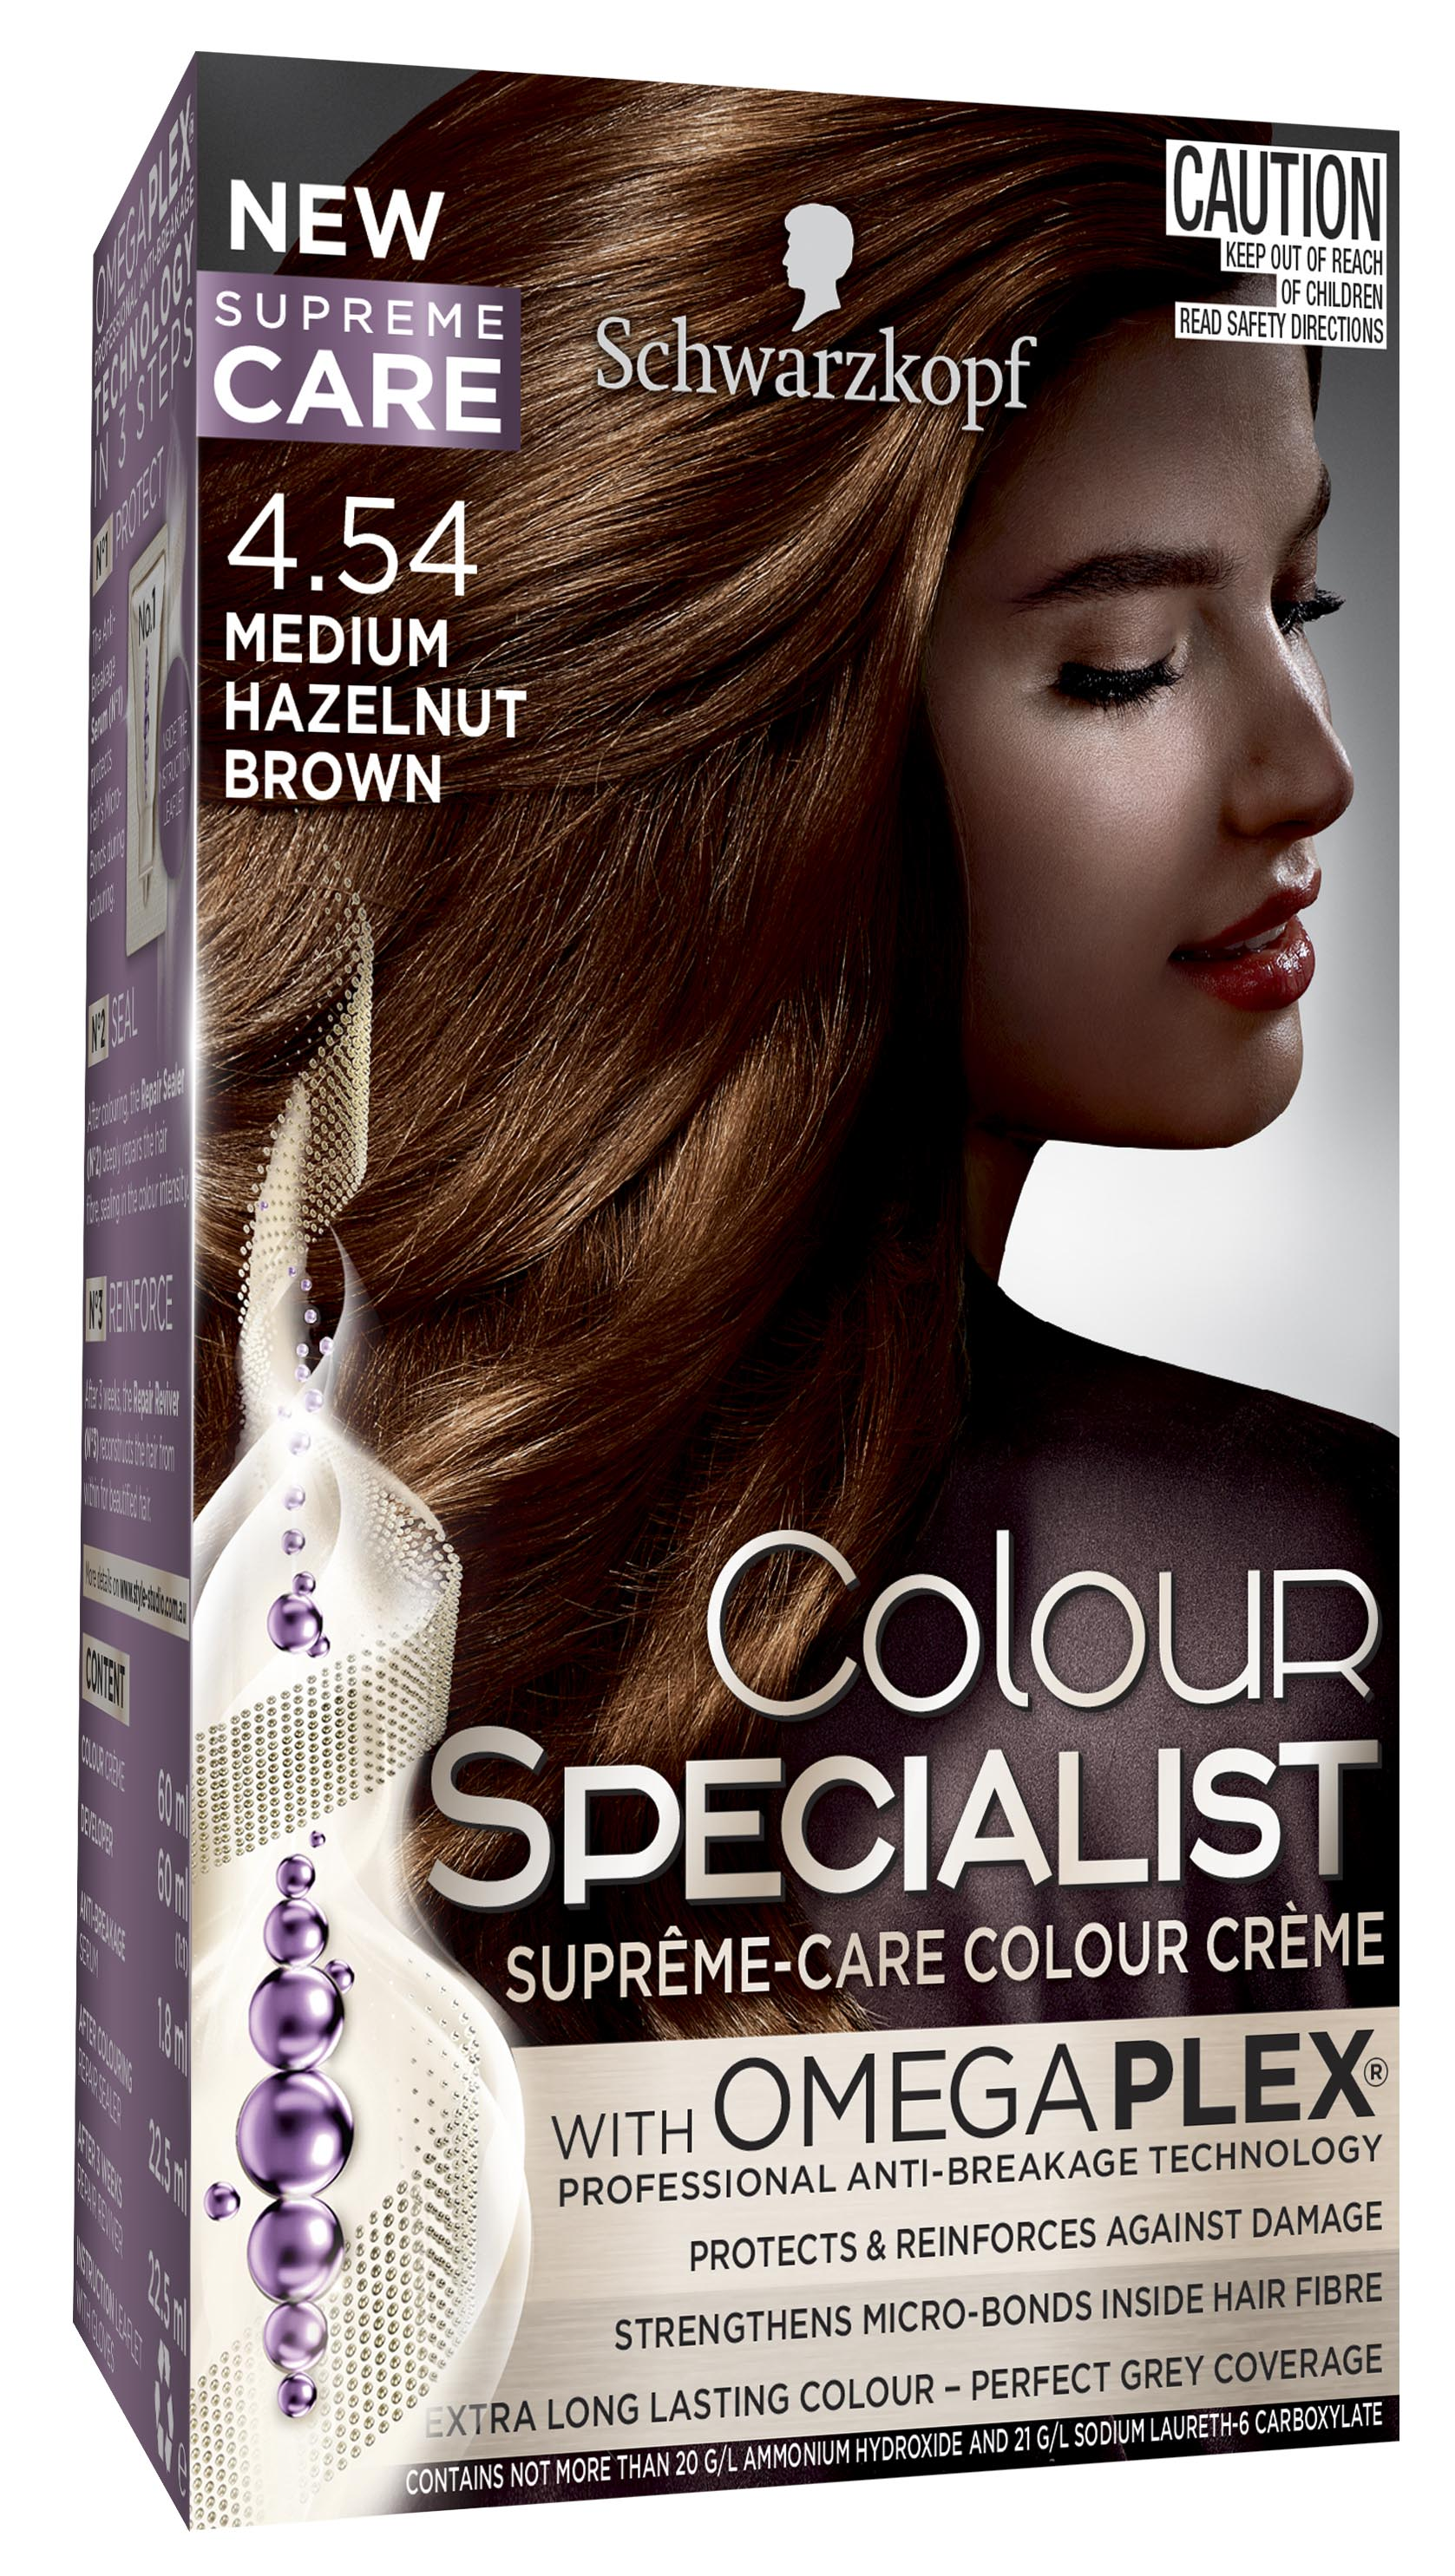 Colour Specialist 454 Medium Hazelnut Brown 3D LF-0040883